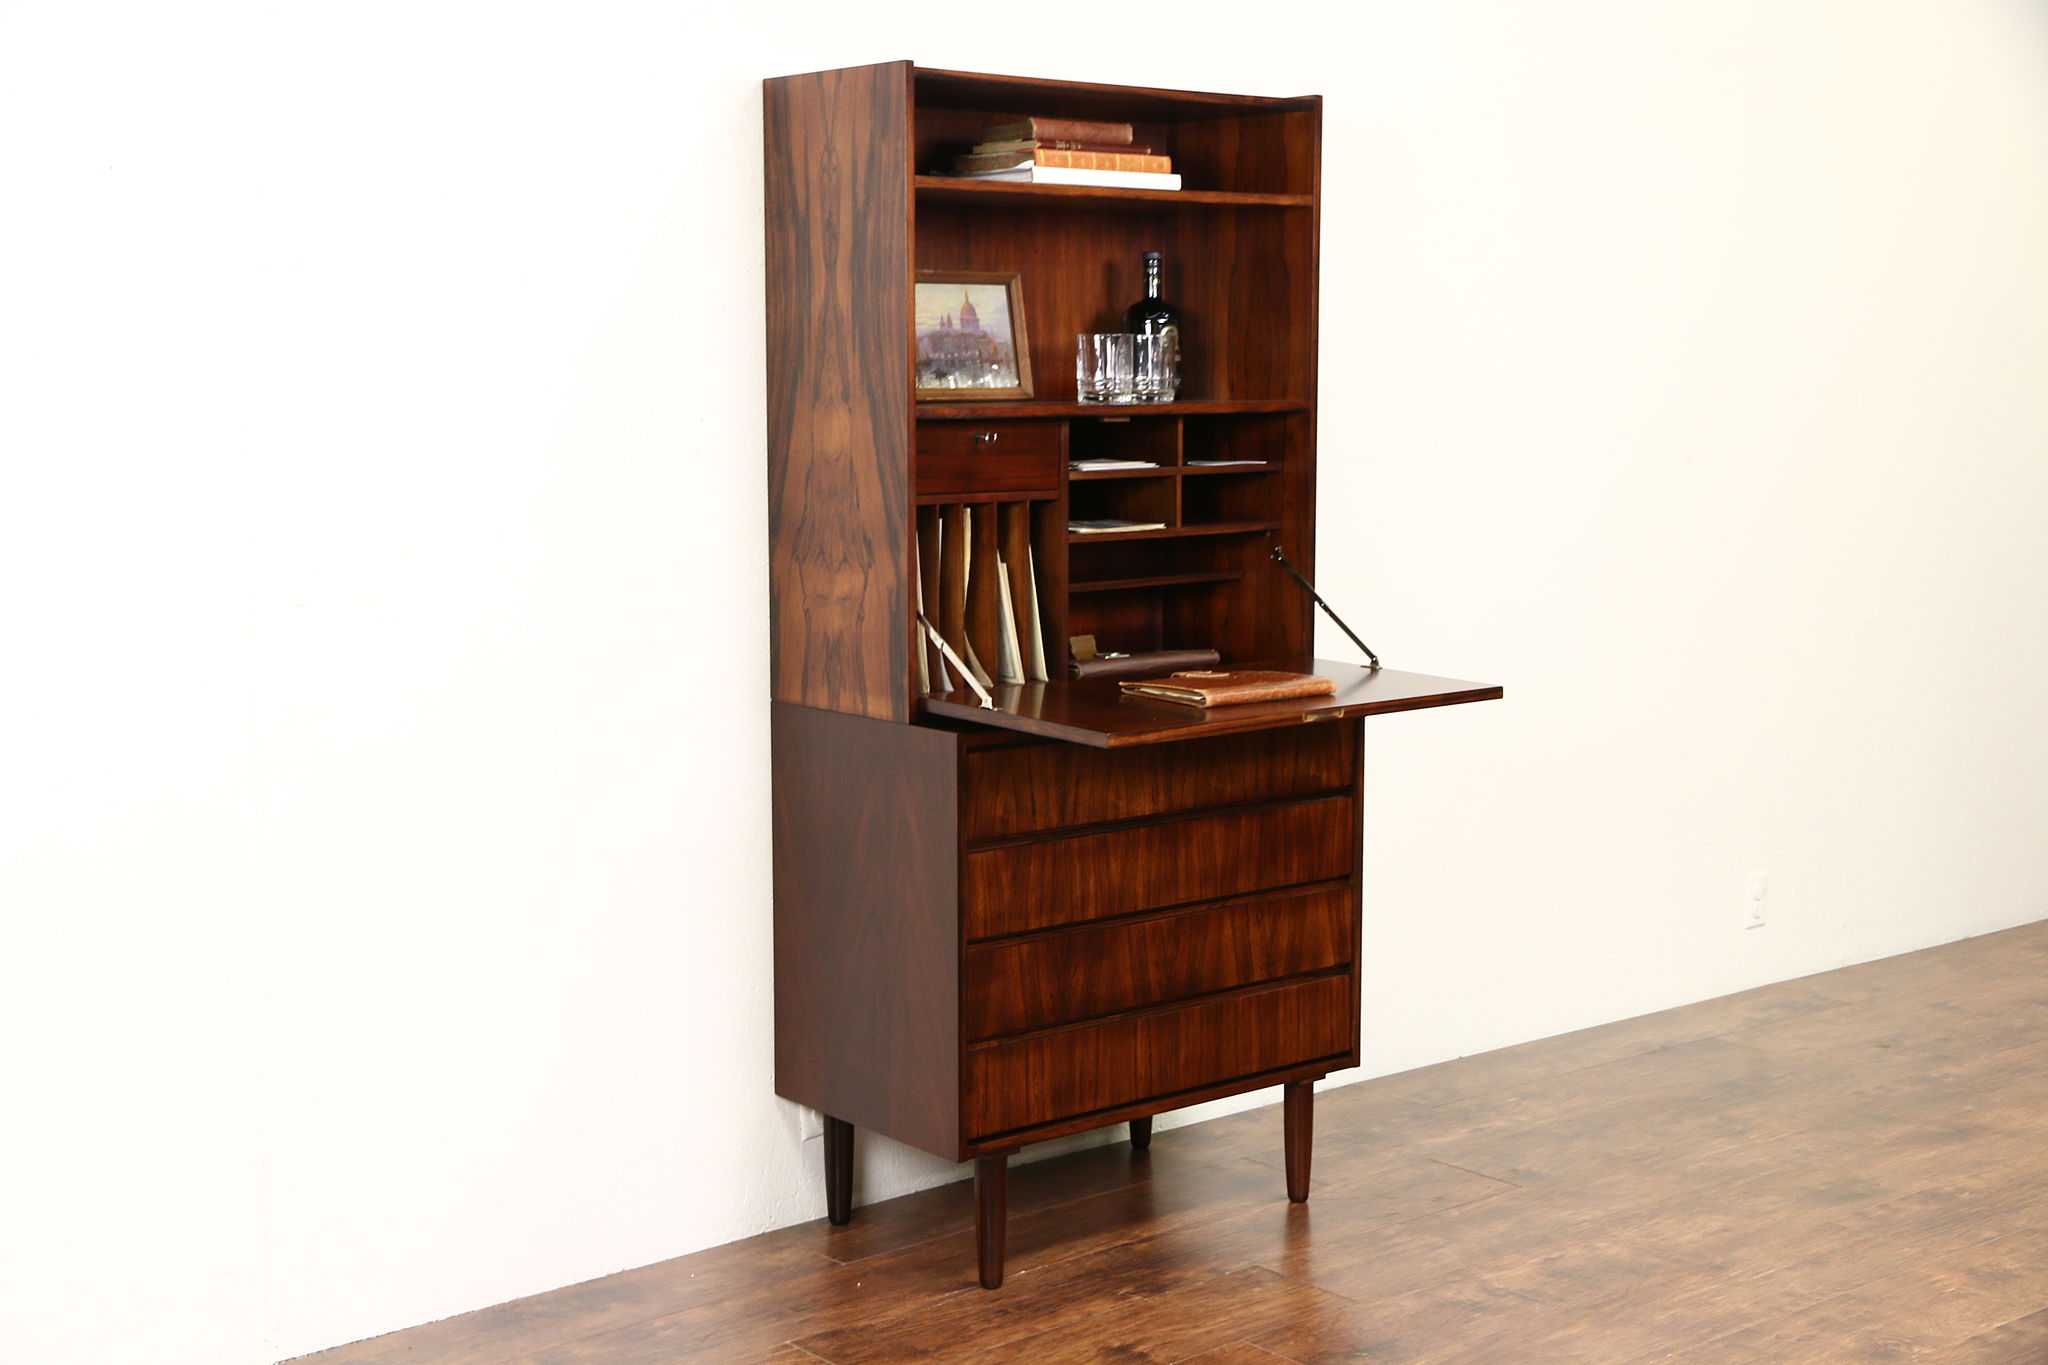 Rosewood Midcentury Danish Modern 1960 S Vintage Secretary Desk Bookcase